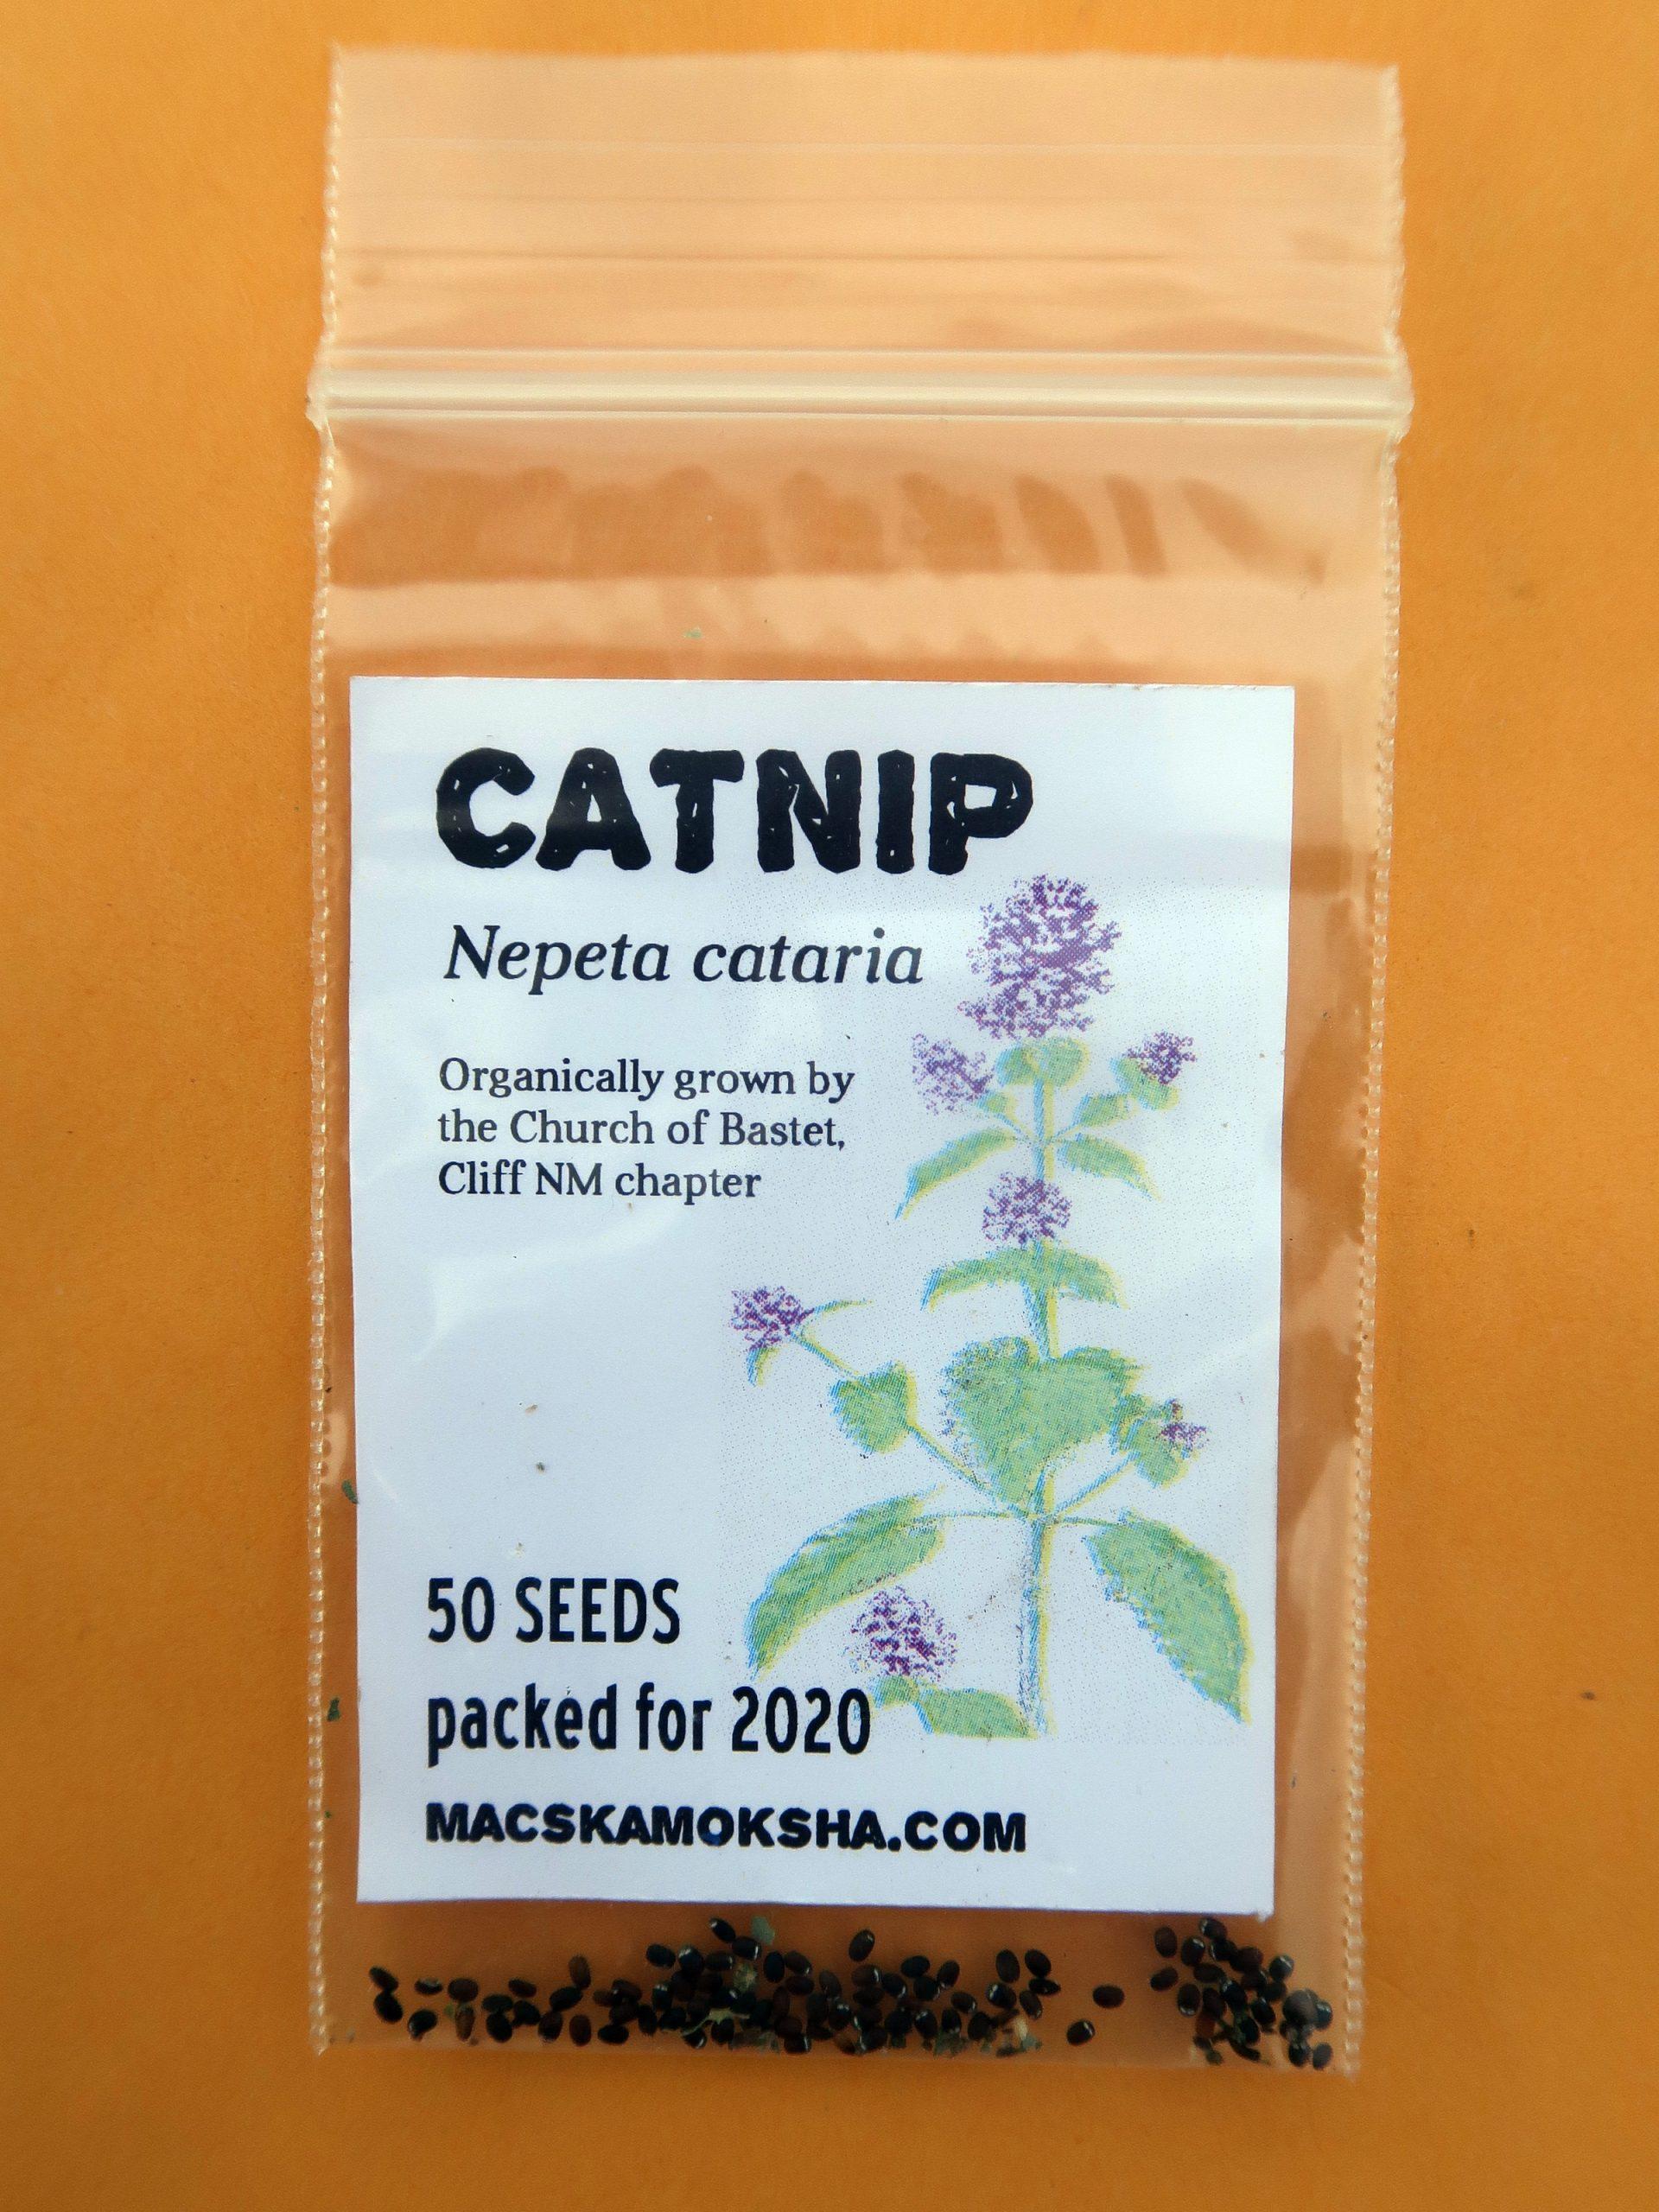 Catnip seed packet